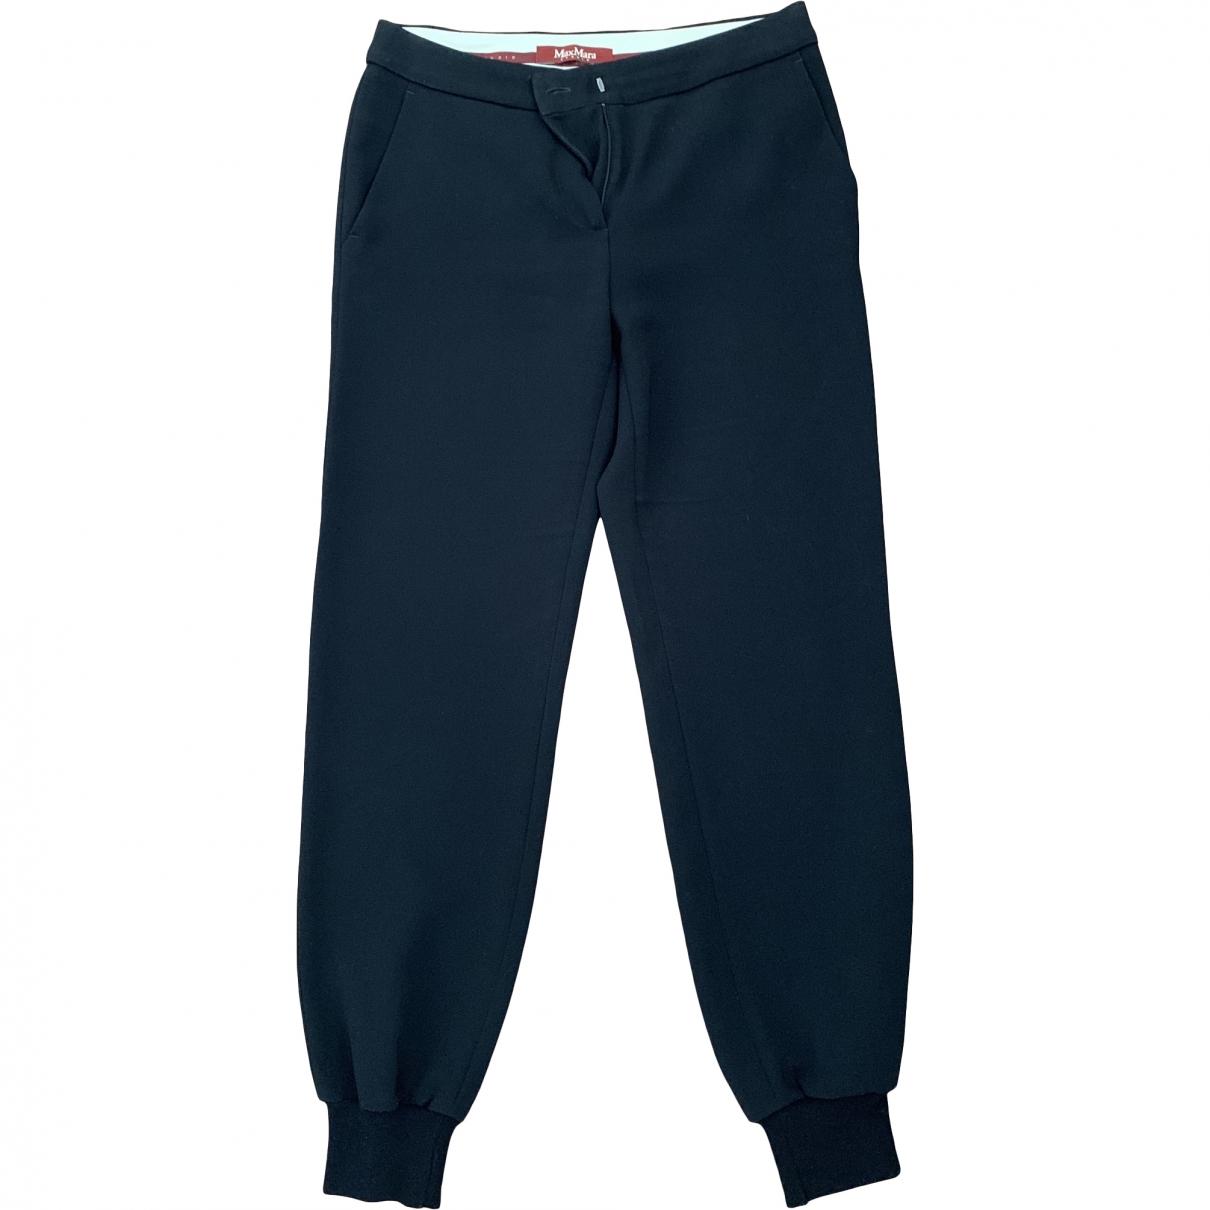 Max Mara Studio \N Black Trousers for Women 38 IT